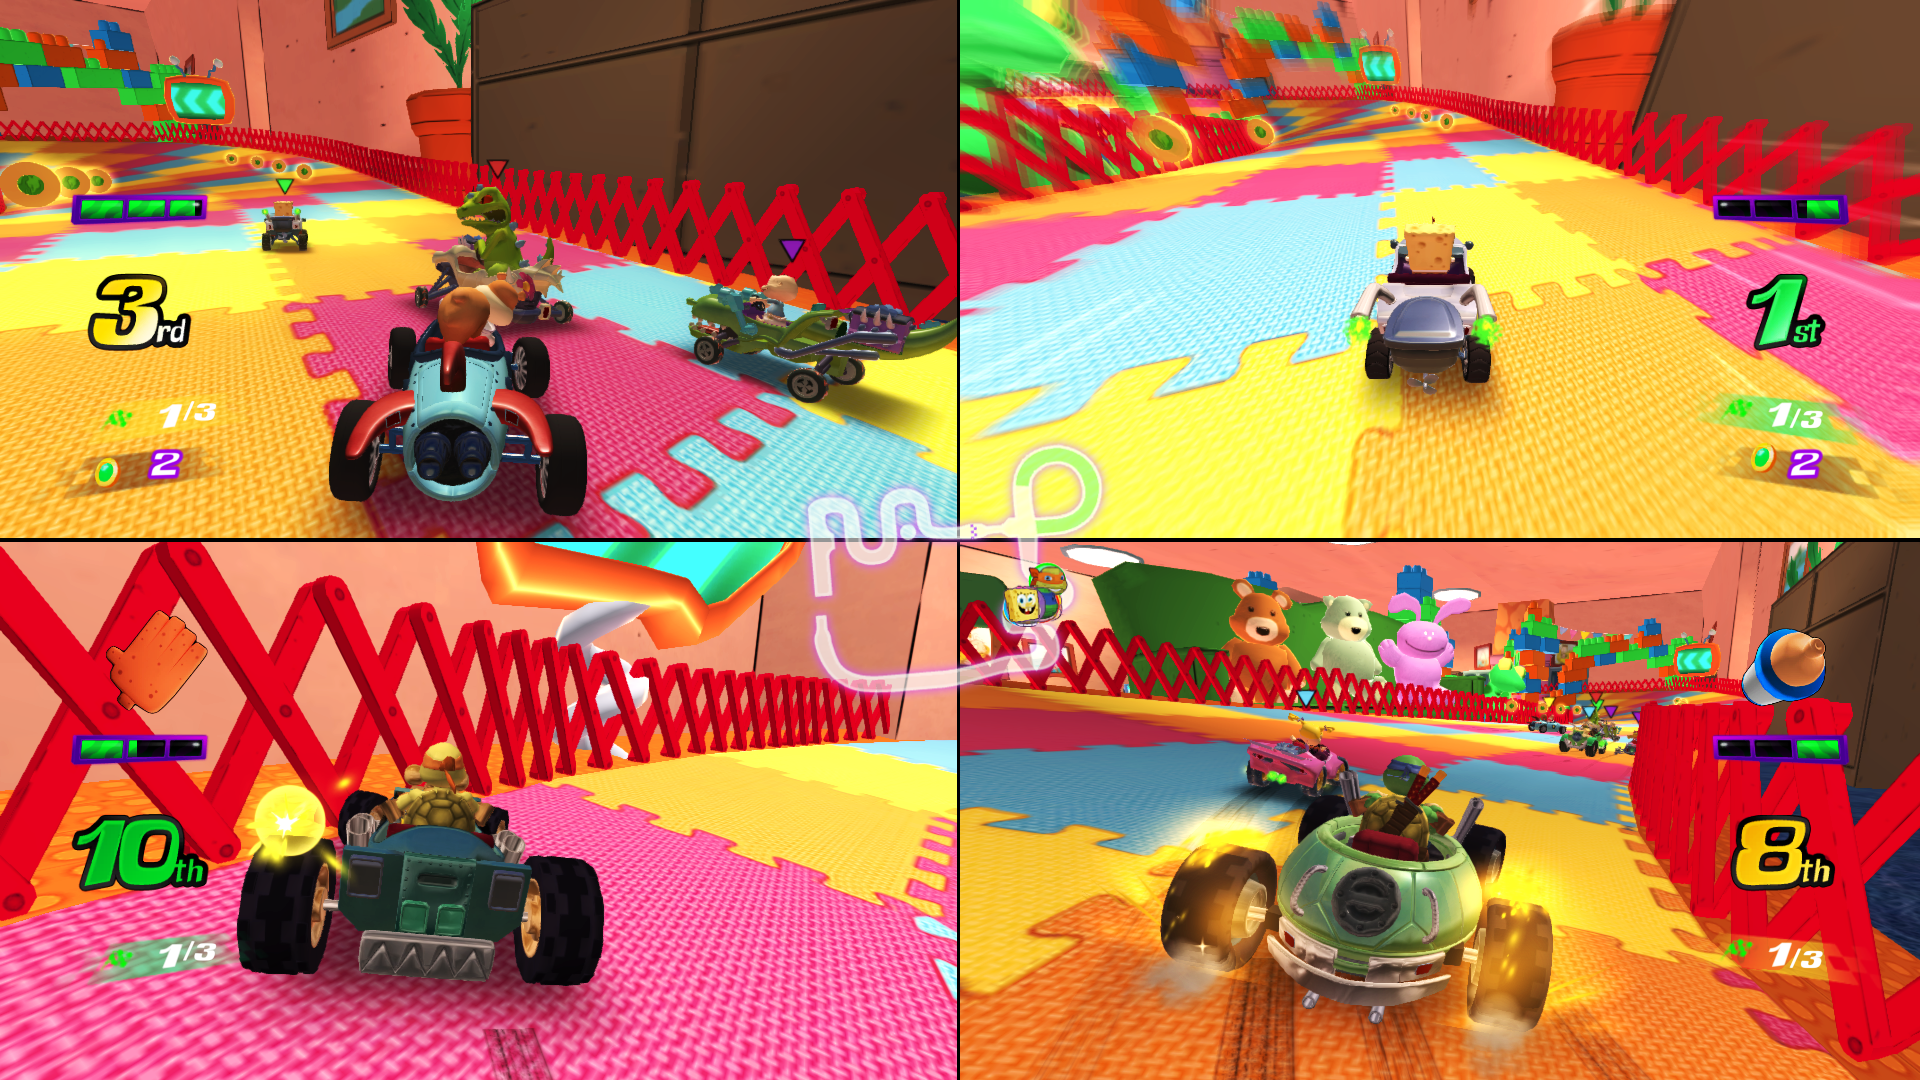 Nickelodeon Kart Racers reunites classic cartoons on